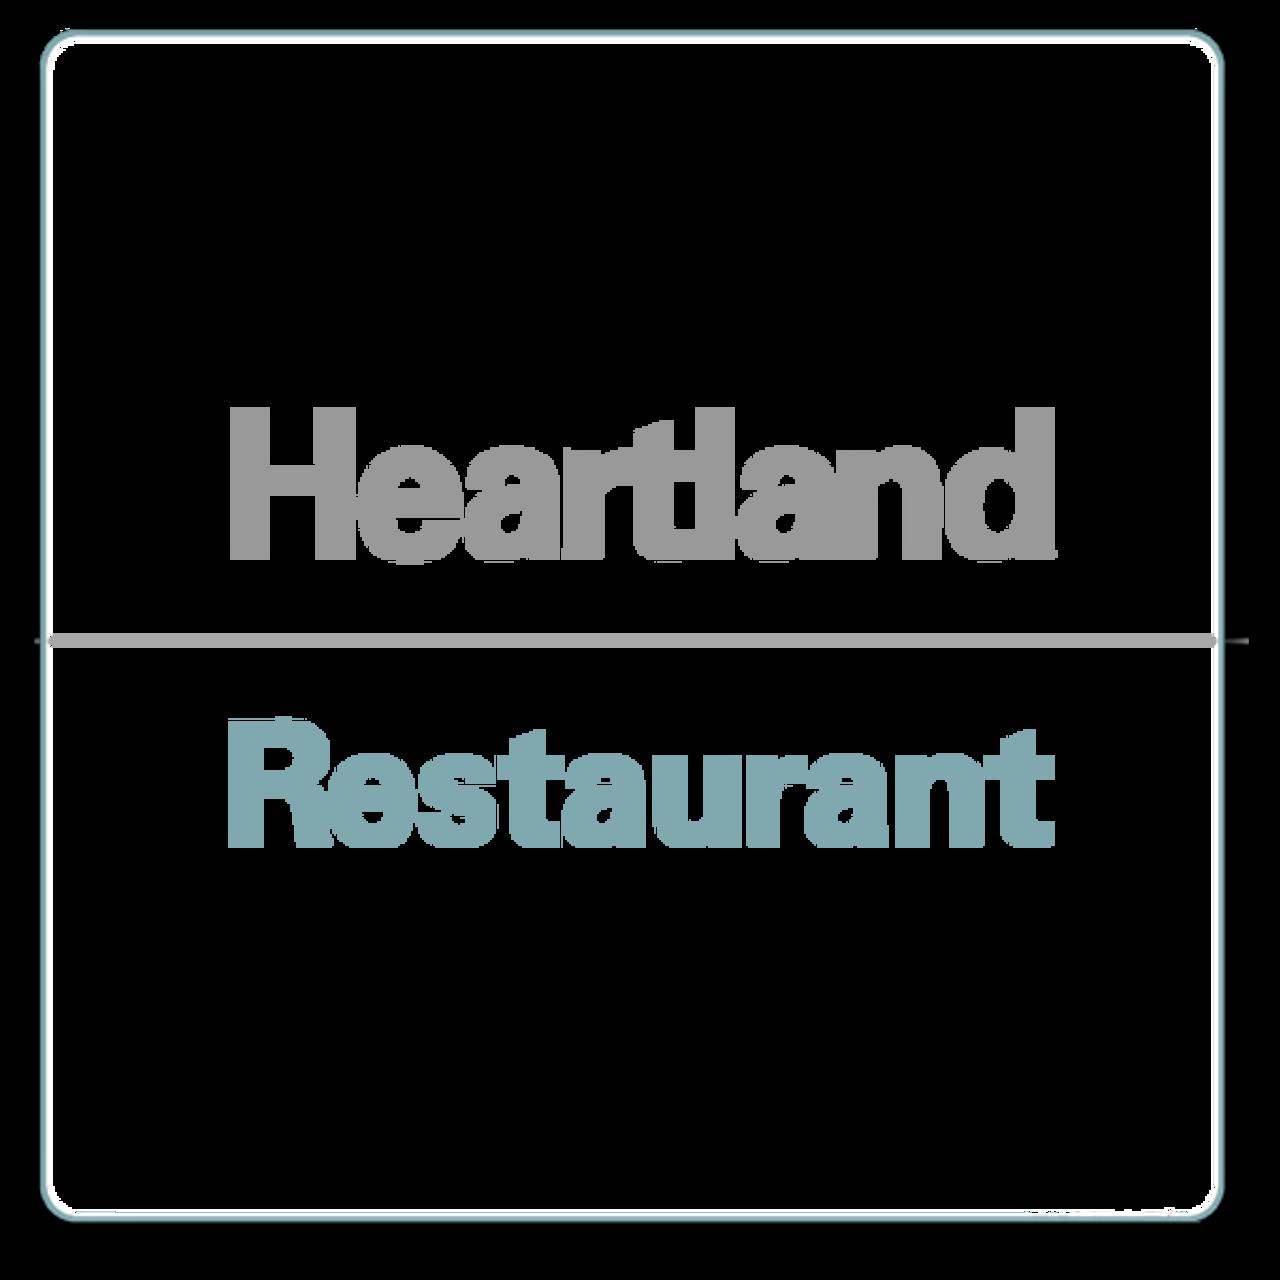 Heartland Restaurant - iPad Restaurant POS